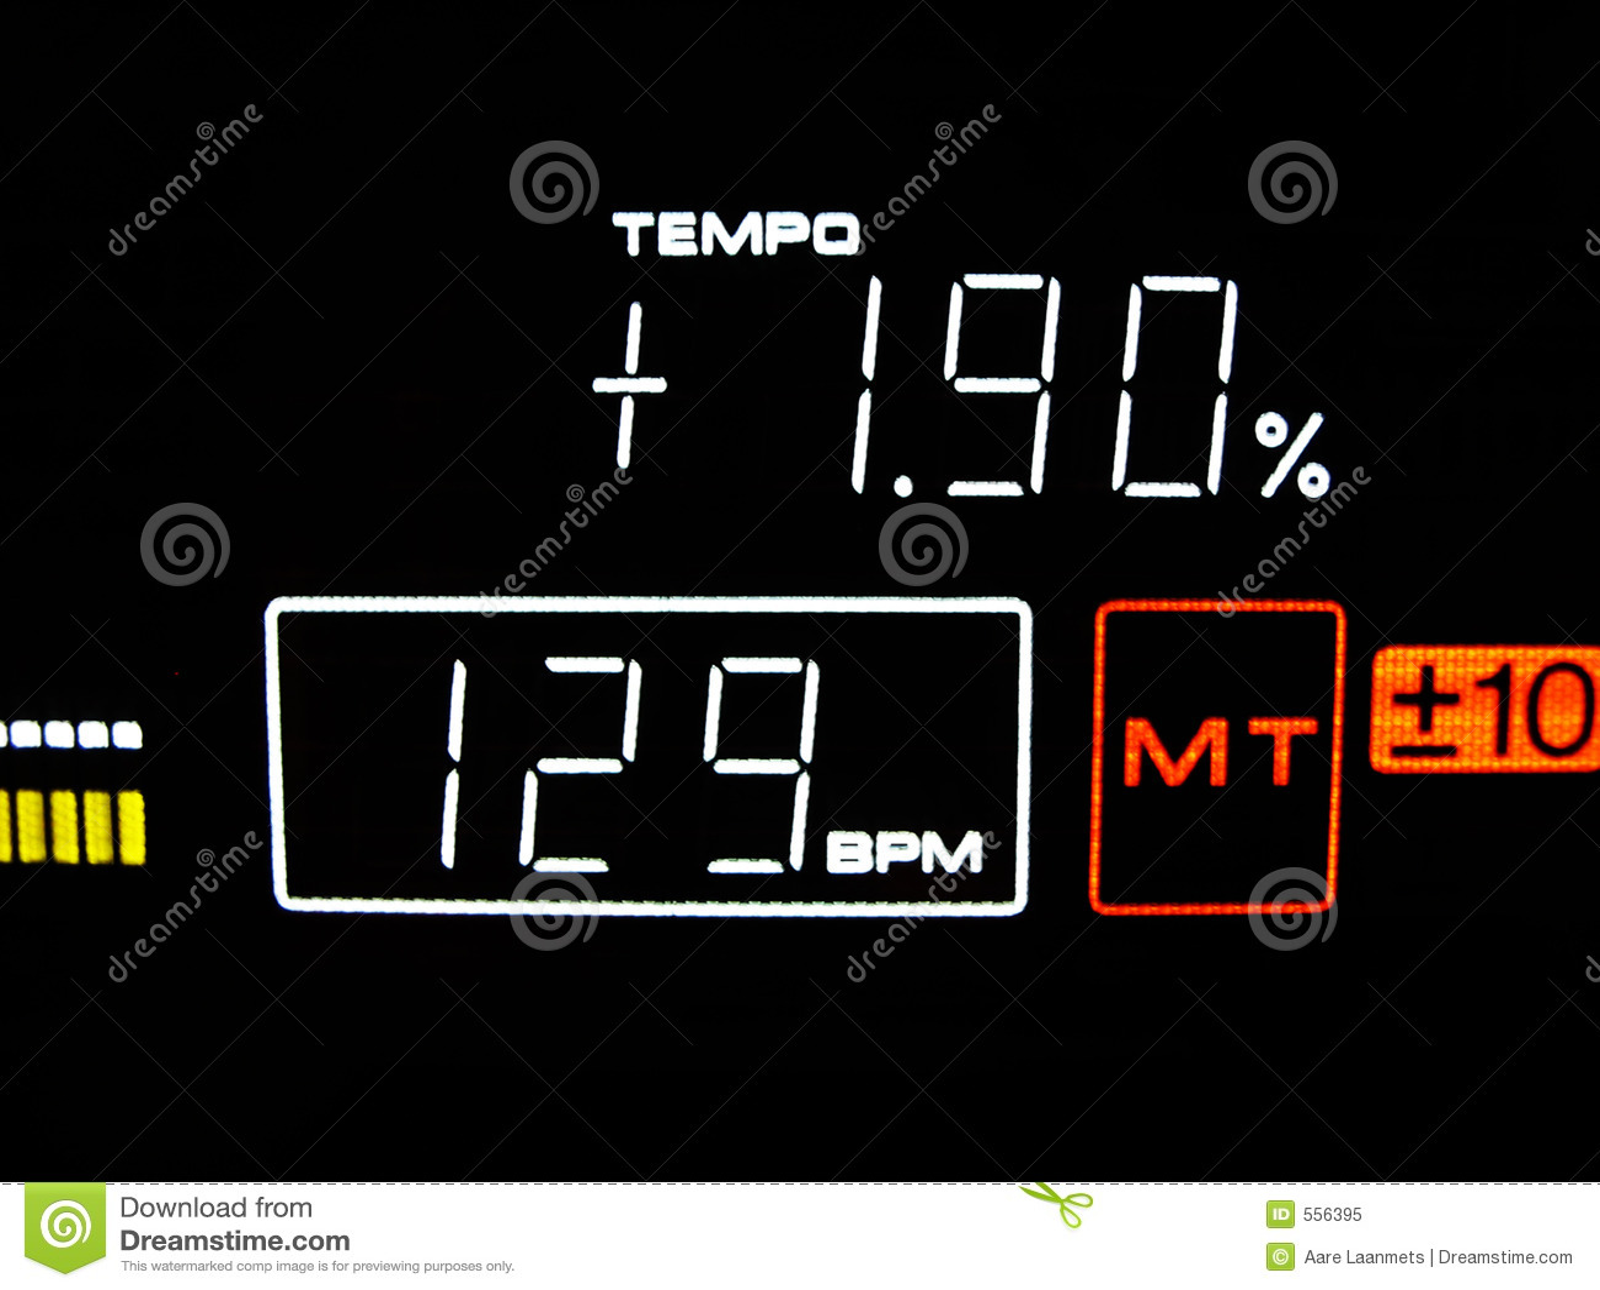 Tempo ist 129 BPM